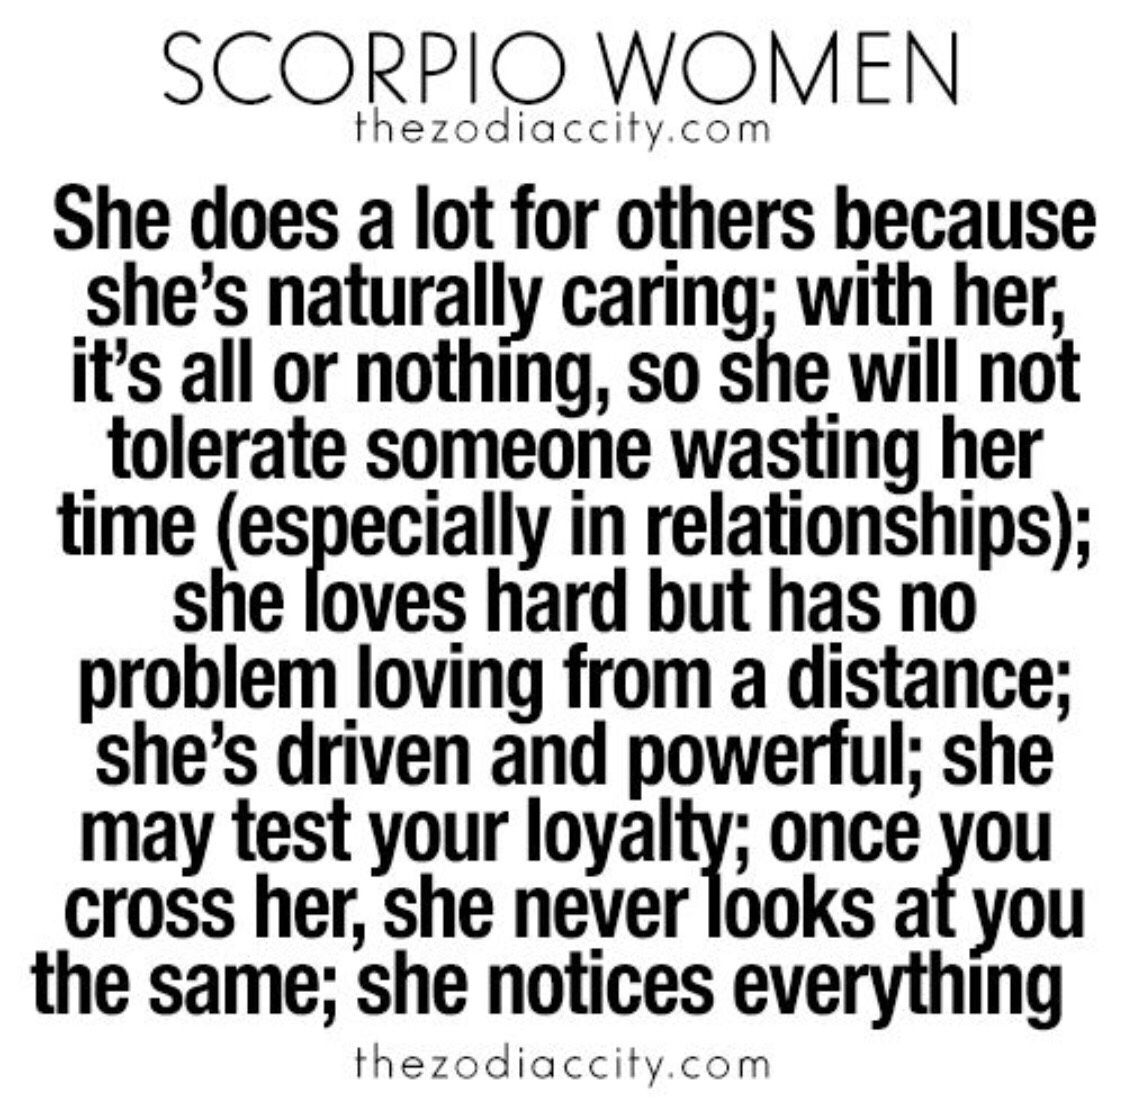 I'm a true Scorpio ~ do you believe? #scorpio #horoscopes #starsign #scorpiowomen #november